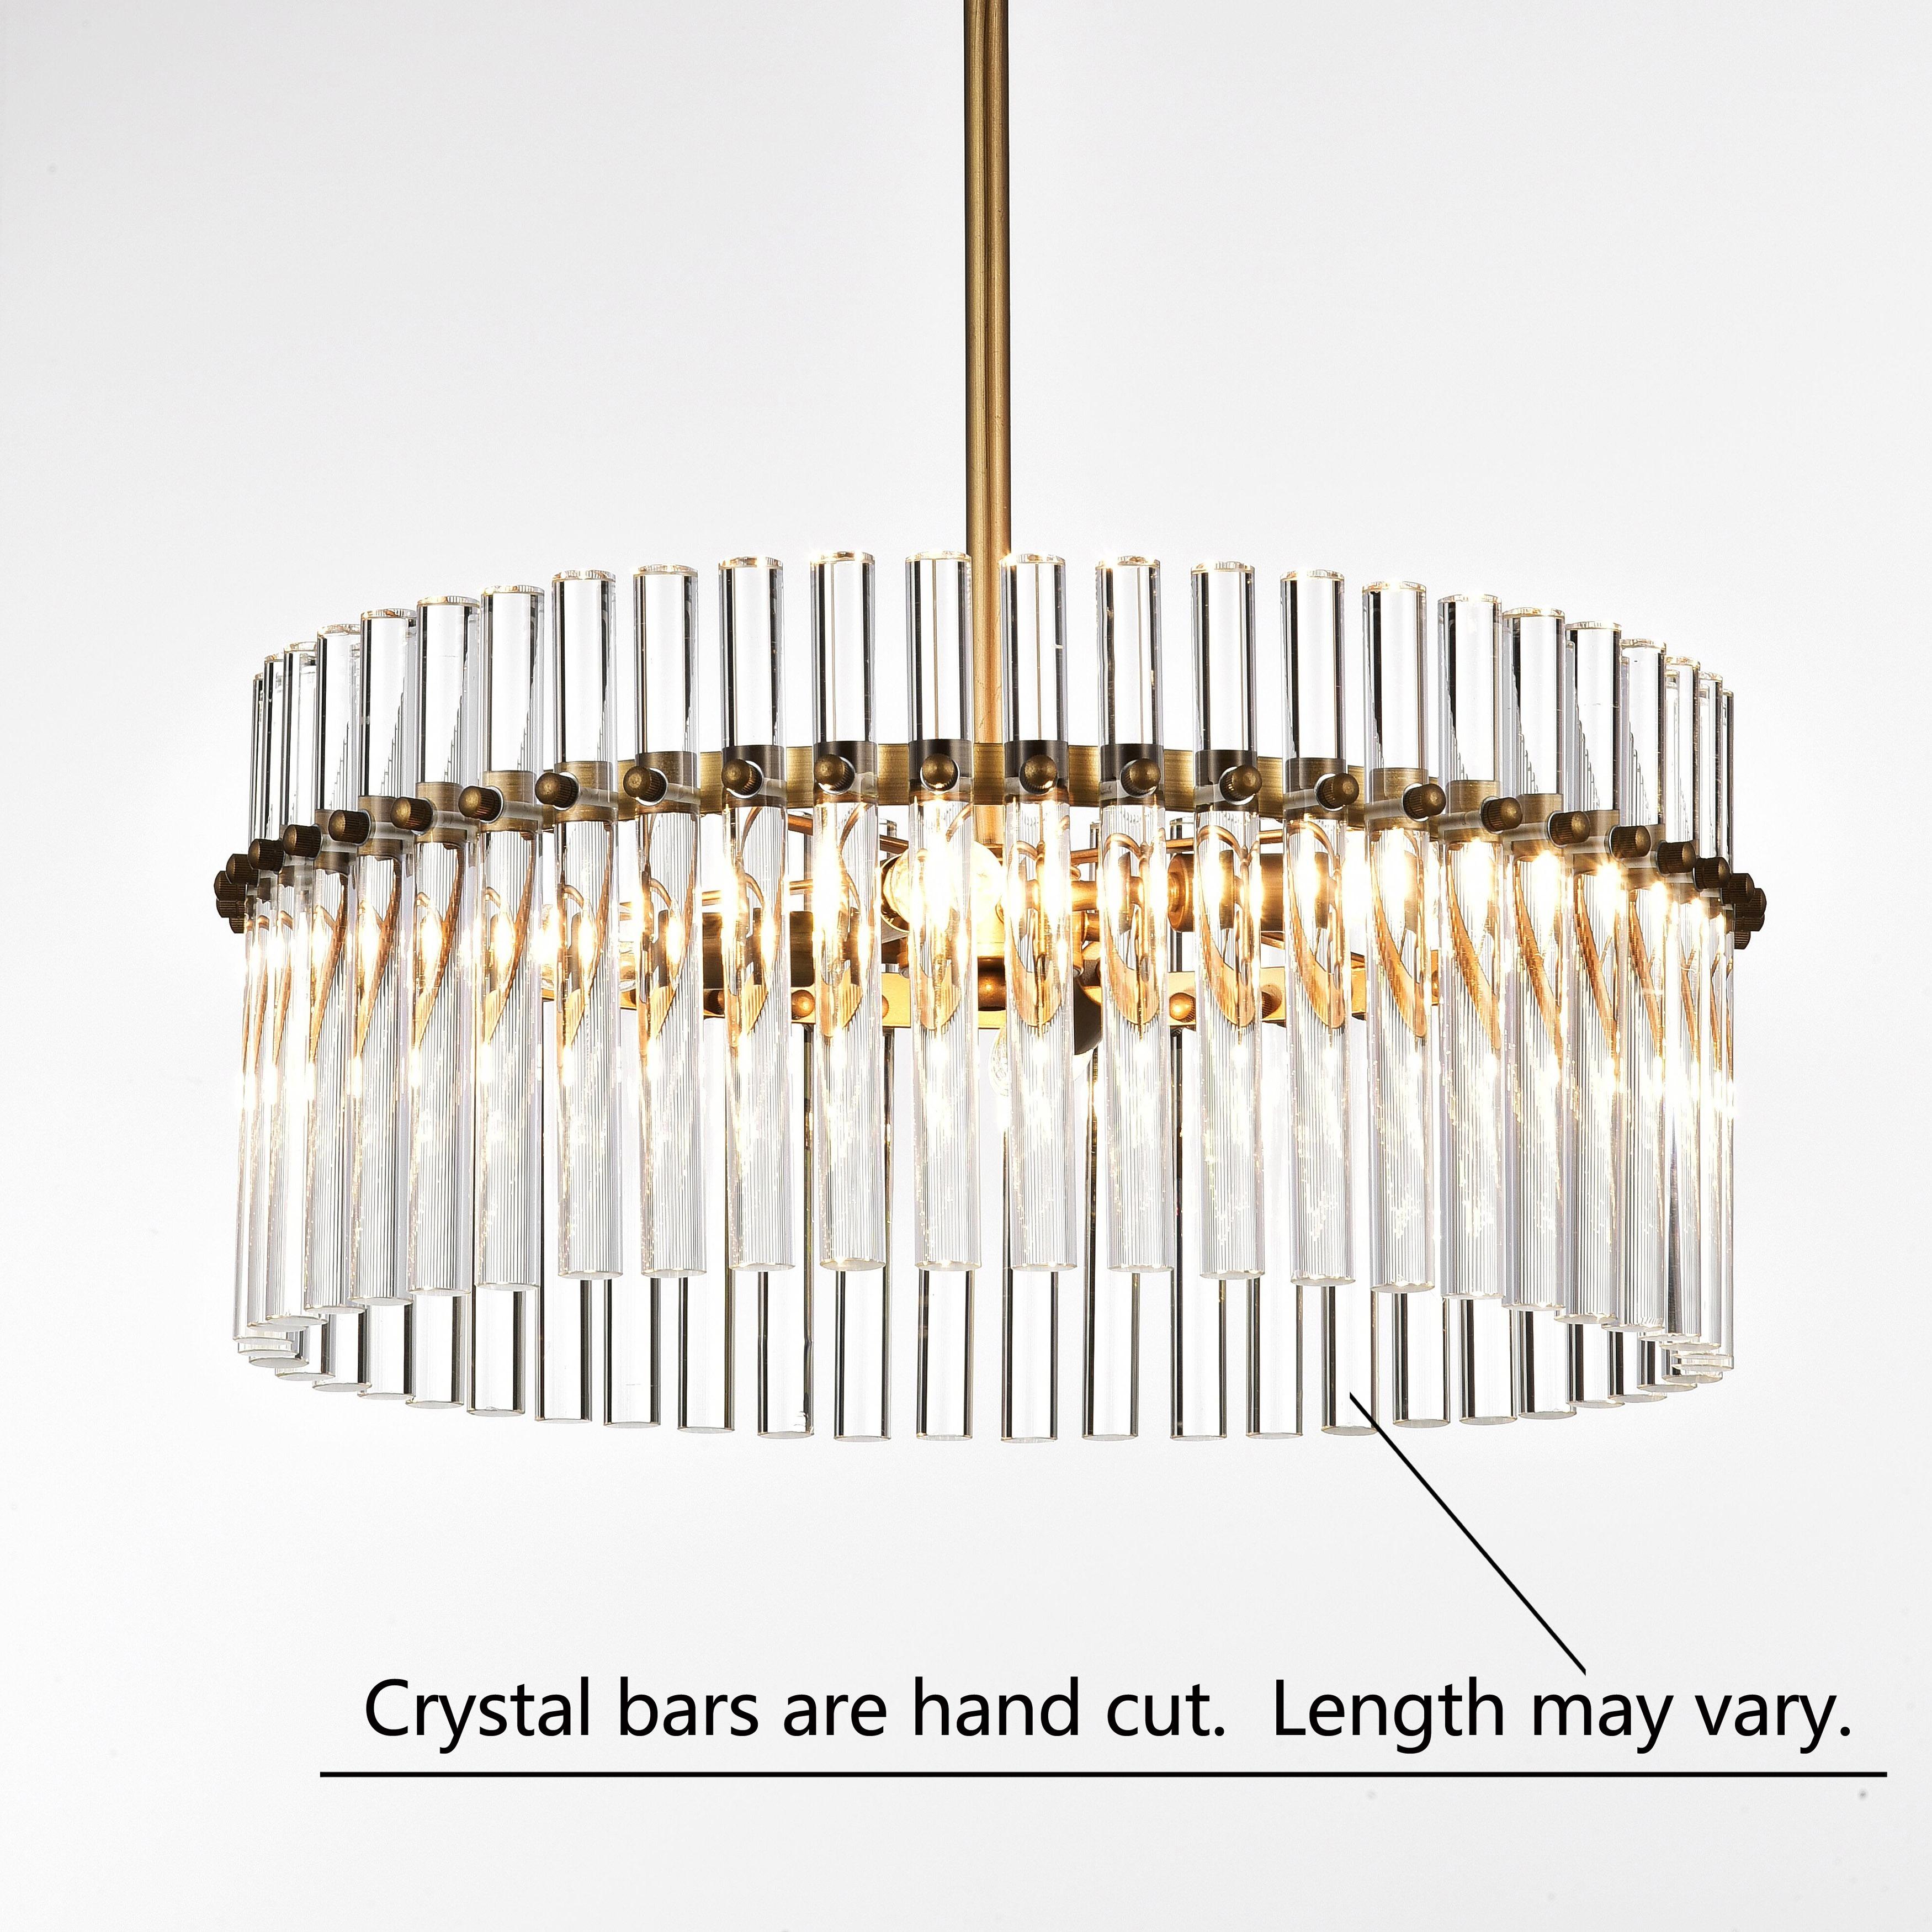 Casandra 4 light brushed brass pendant crystal chandelier free casandra 4 light brushed brass pendant crystal chandelier free shipping today overstock 22373626 arubaitofo Images